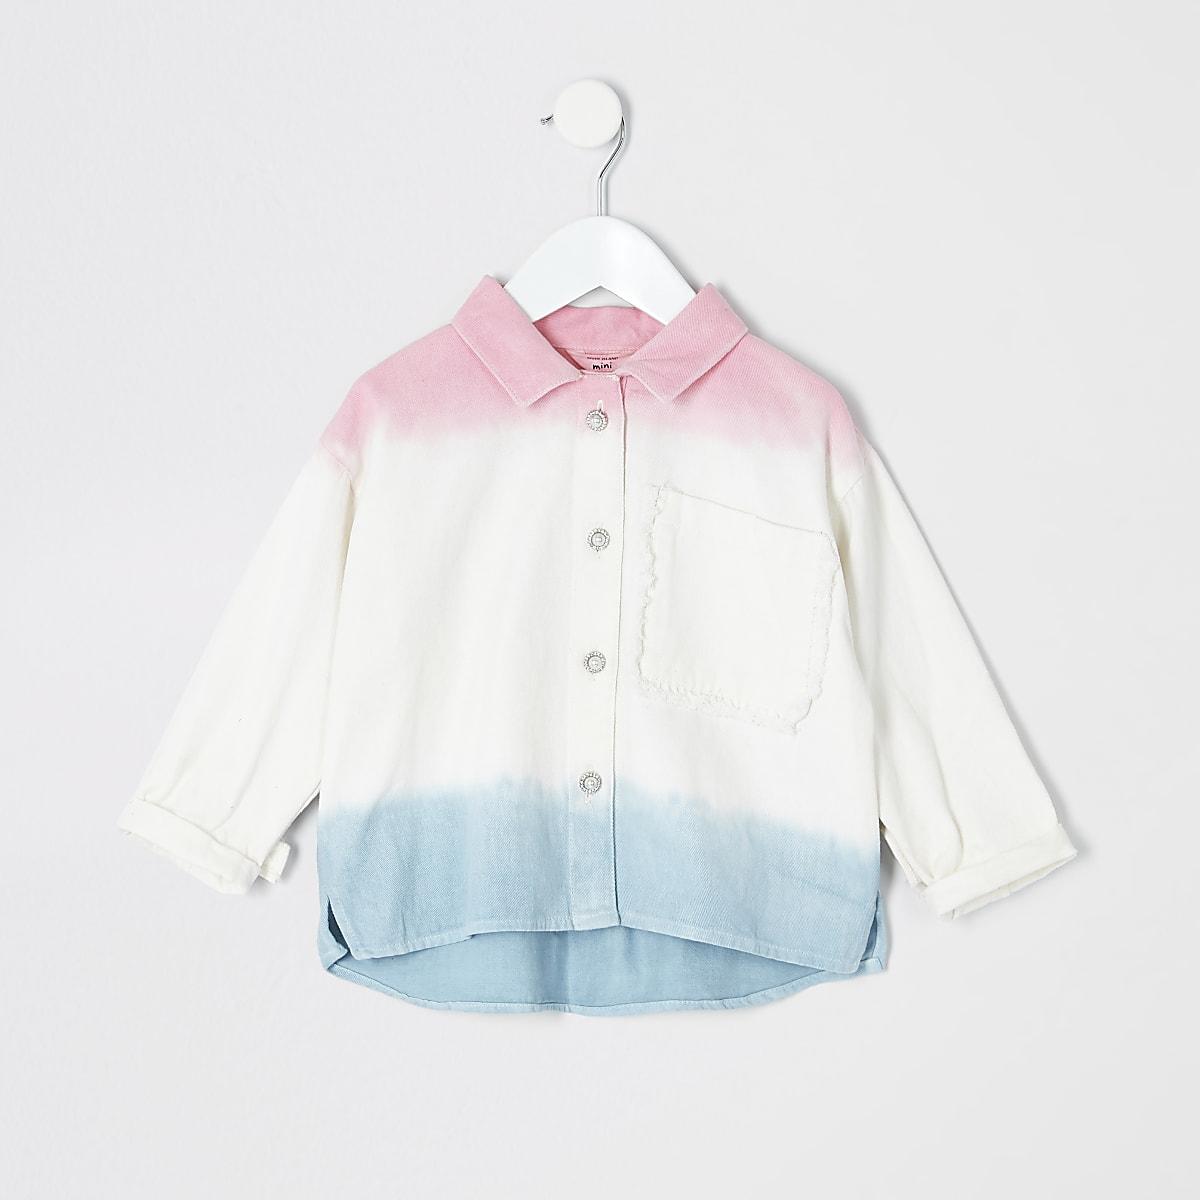 Mini - Wit ombré shacket voor meisjes